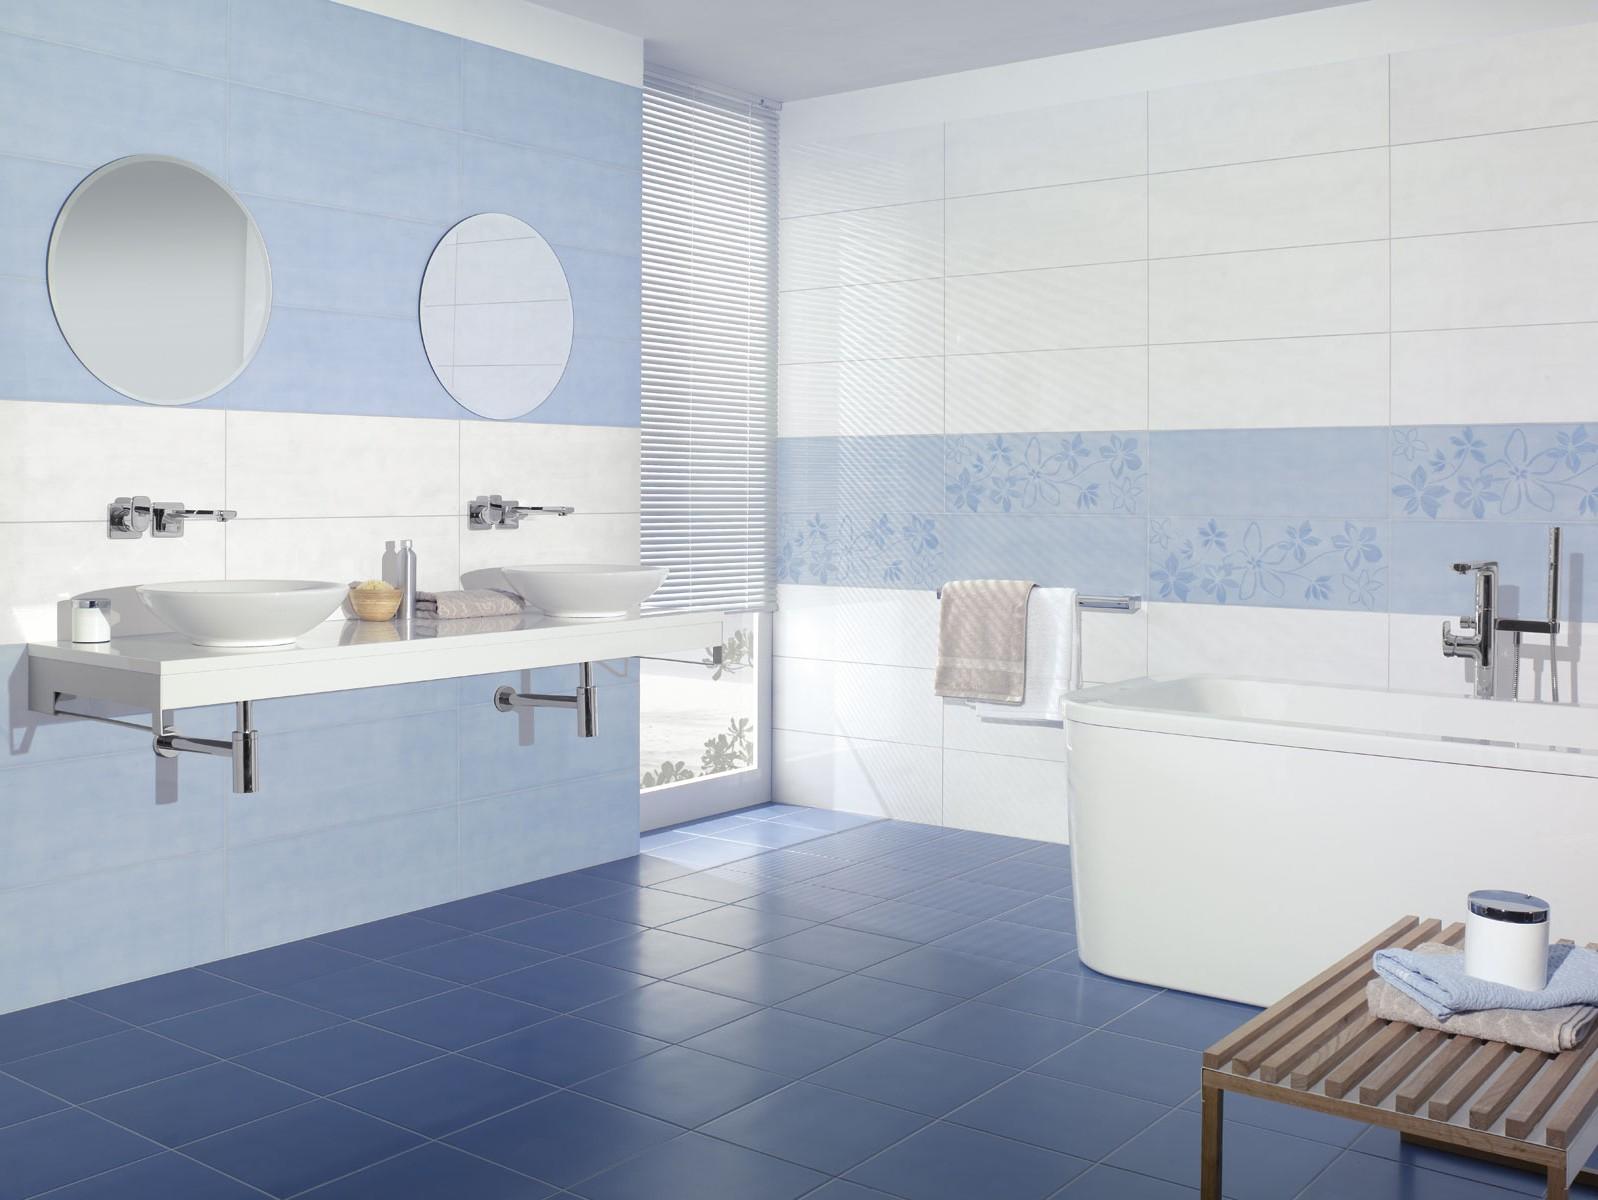 carrelage sol salle de bain villeroy et boch carrelage